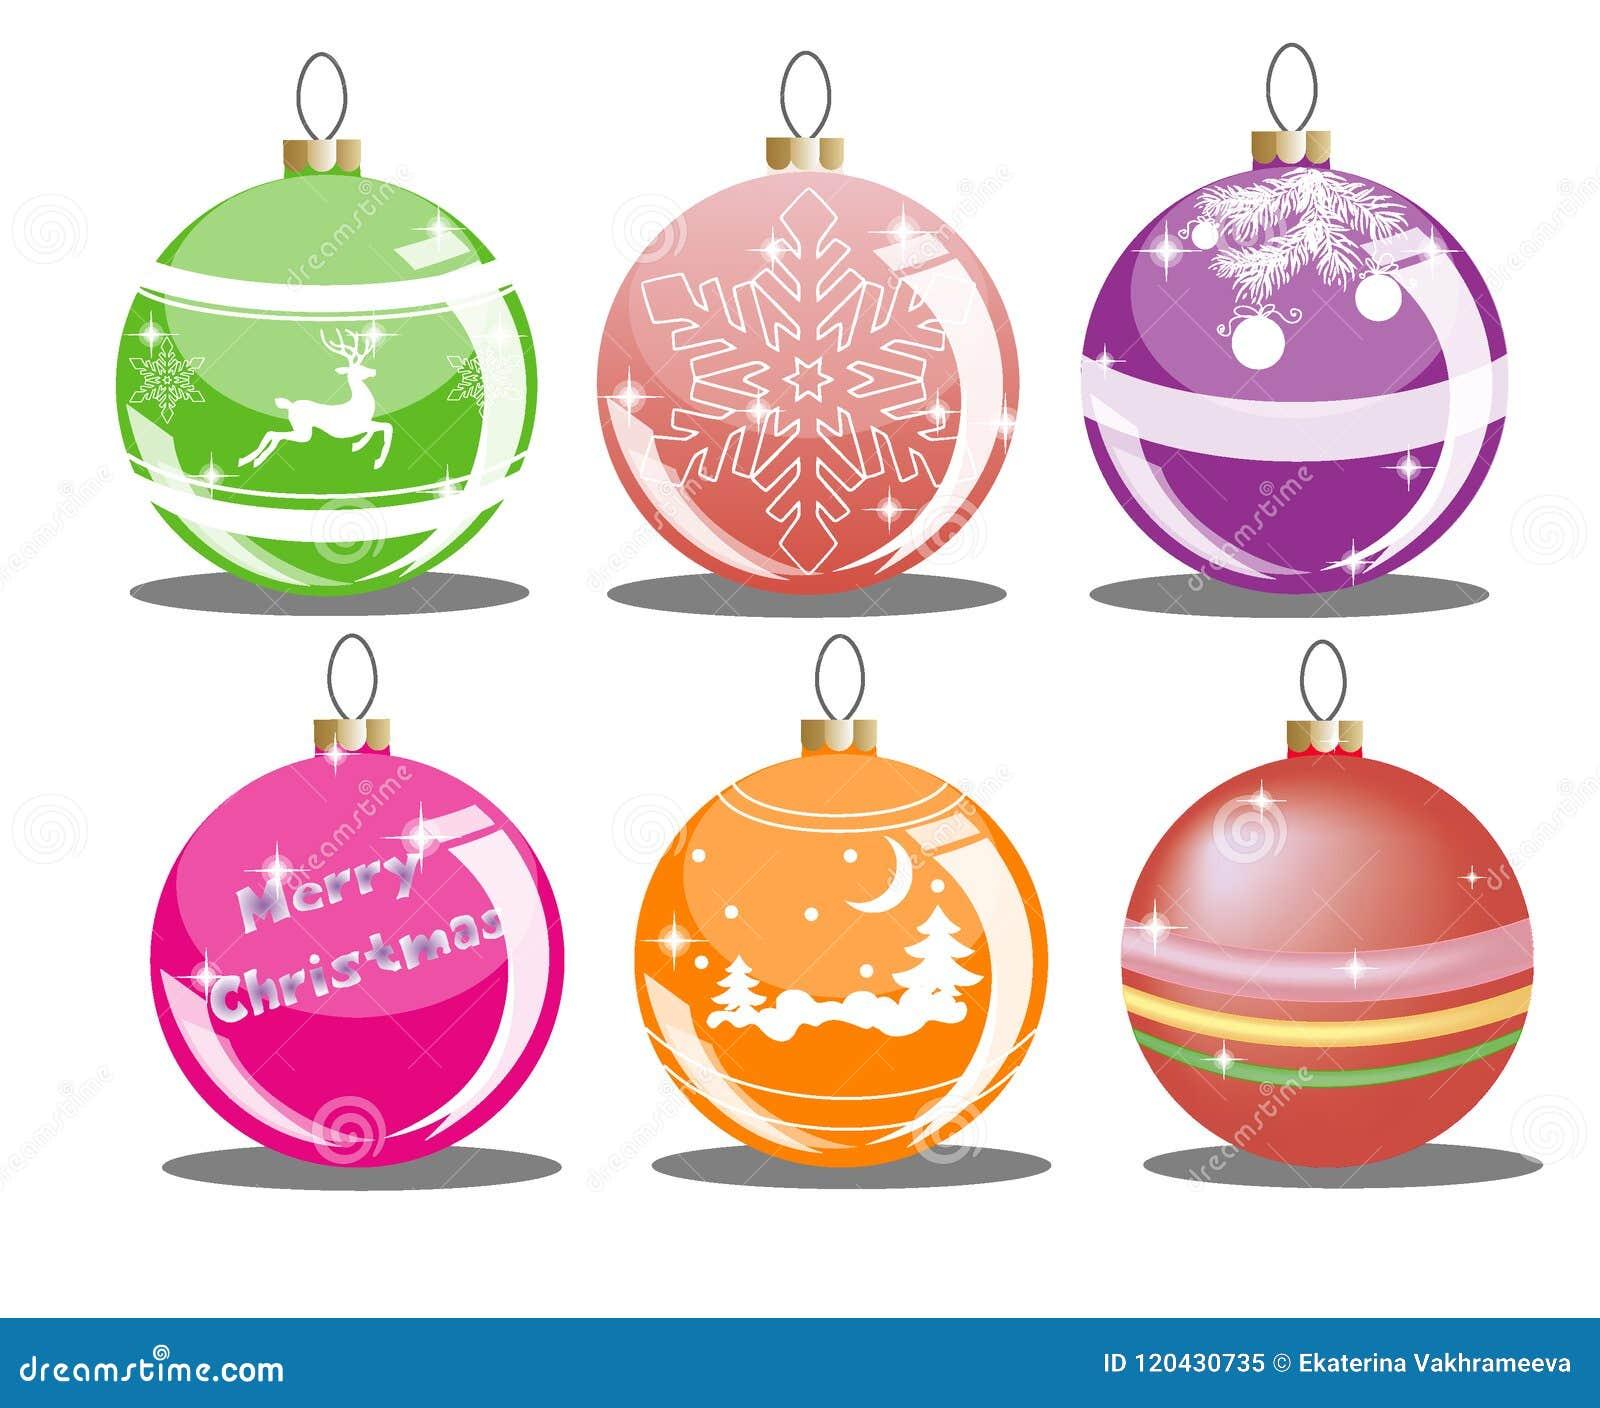 Colorful Christmas Ornaments Drawings.Set Of Christmas Balls Stock Vector Illustration Of Deer